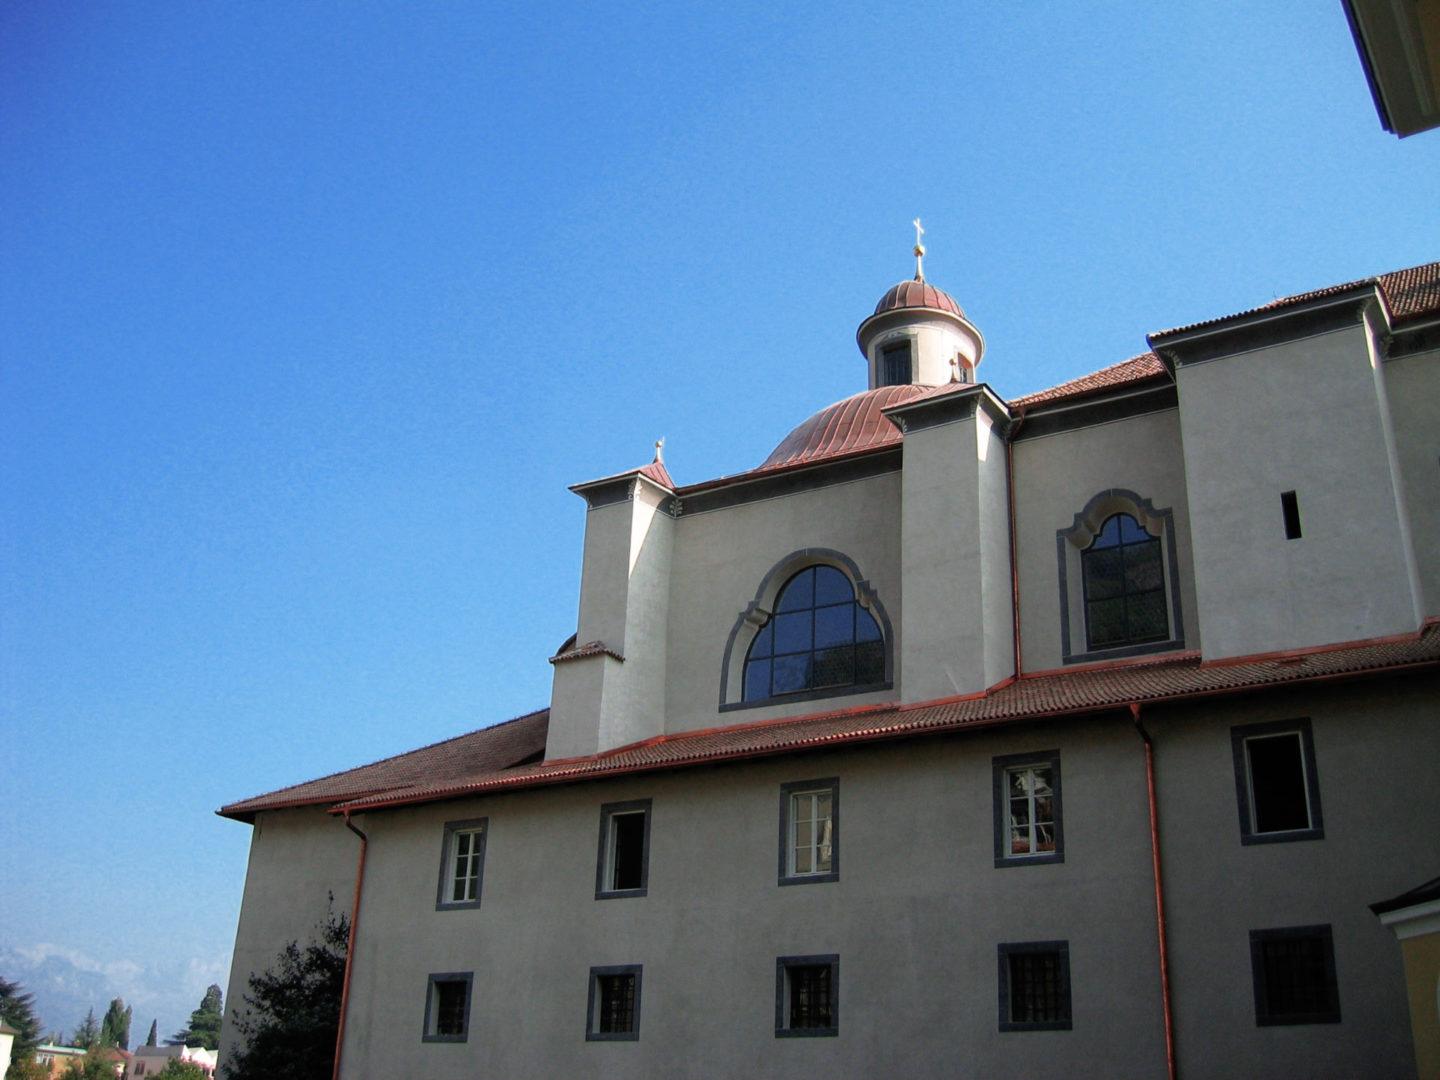 Kirche Muri scaled - Referenze